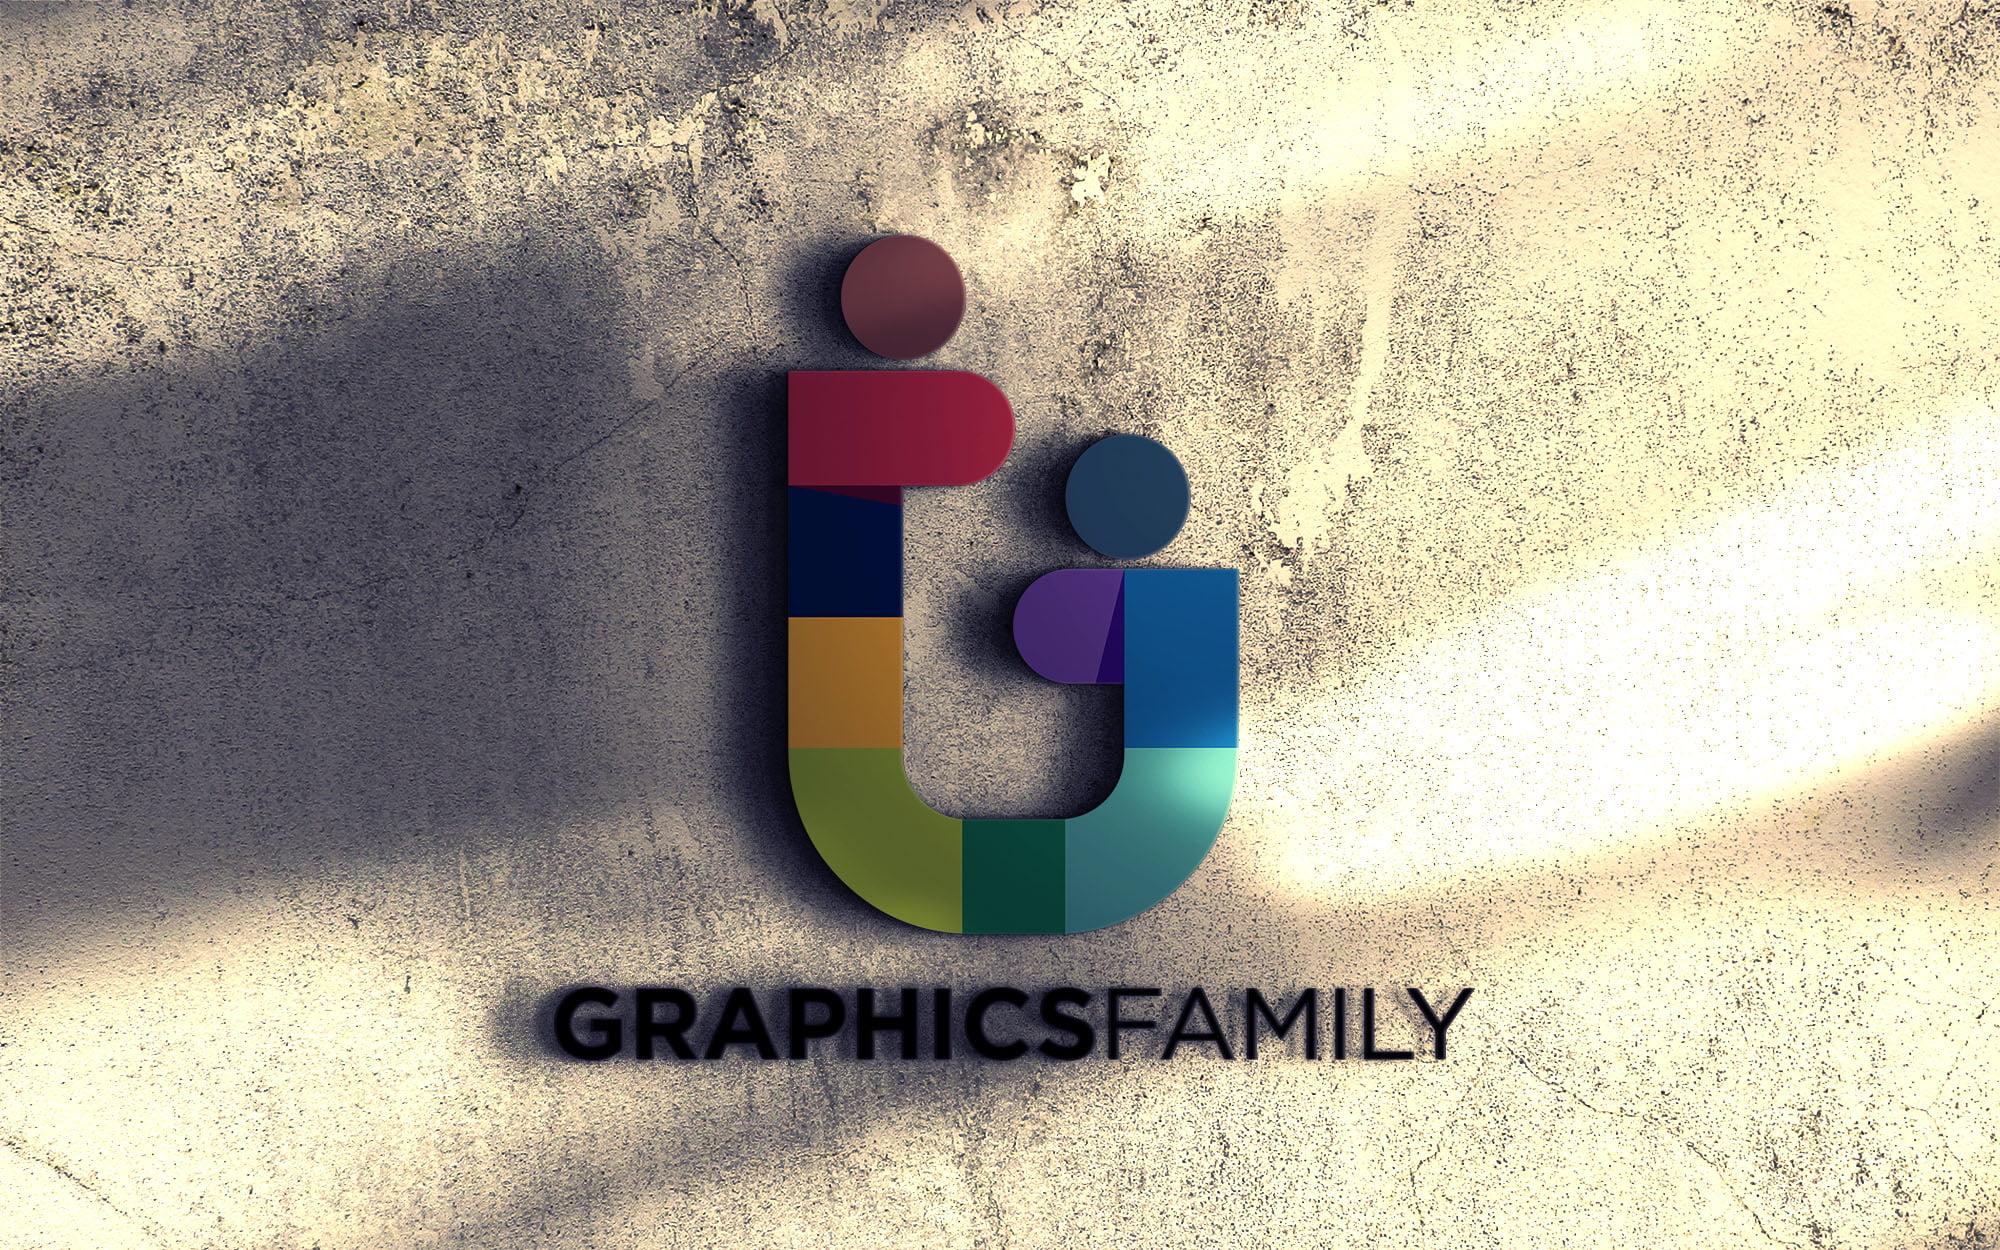 Graphicsfamily Realistic 3d wall logo mockup